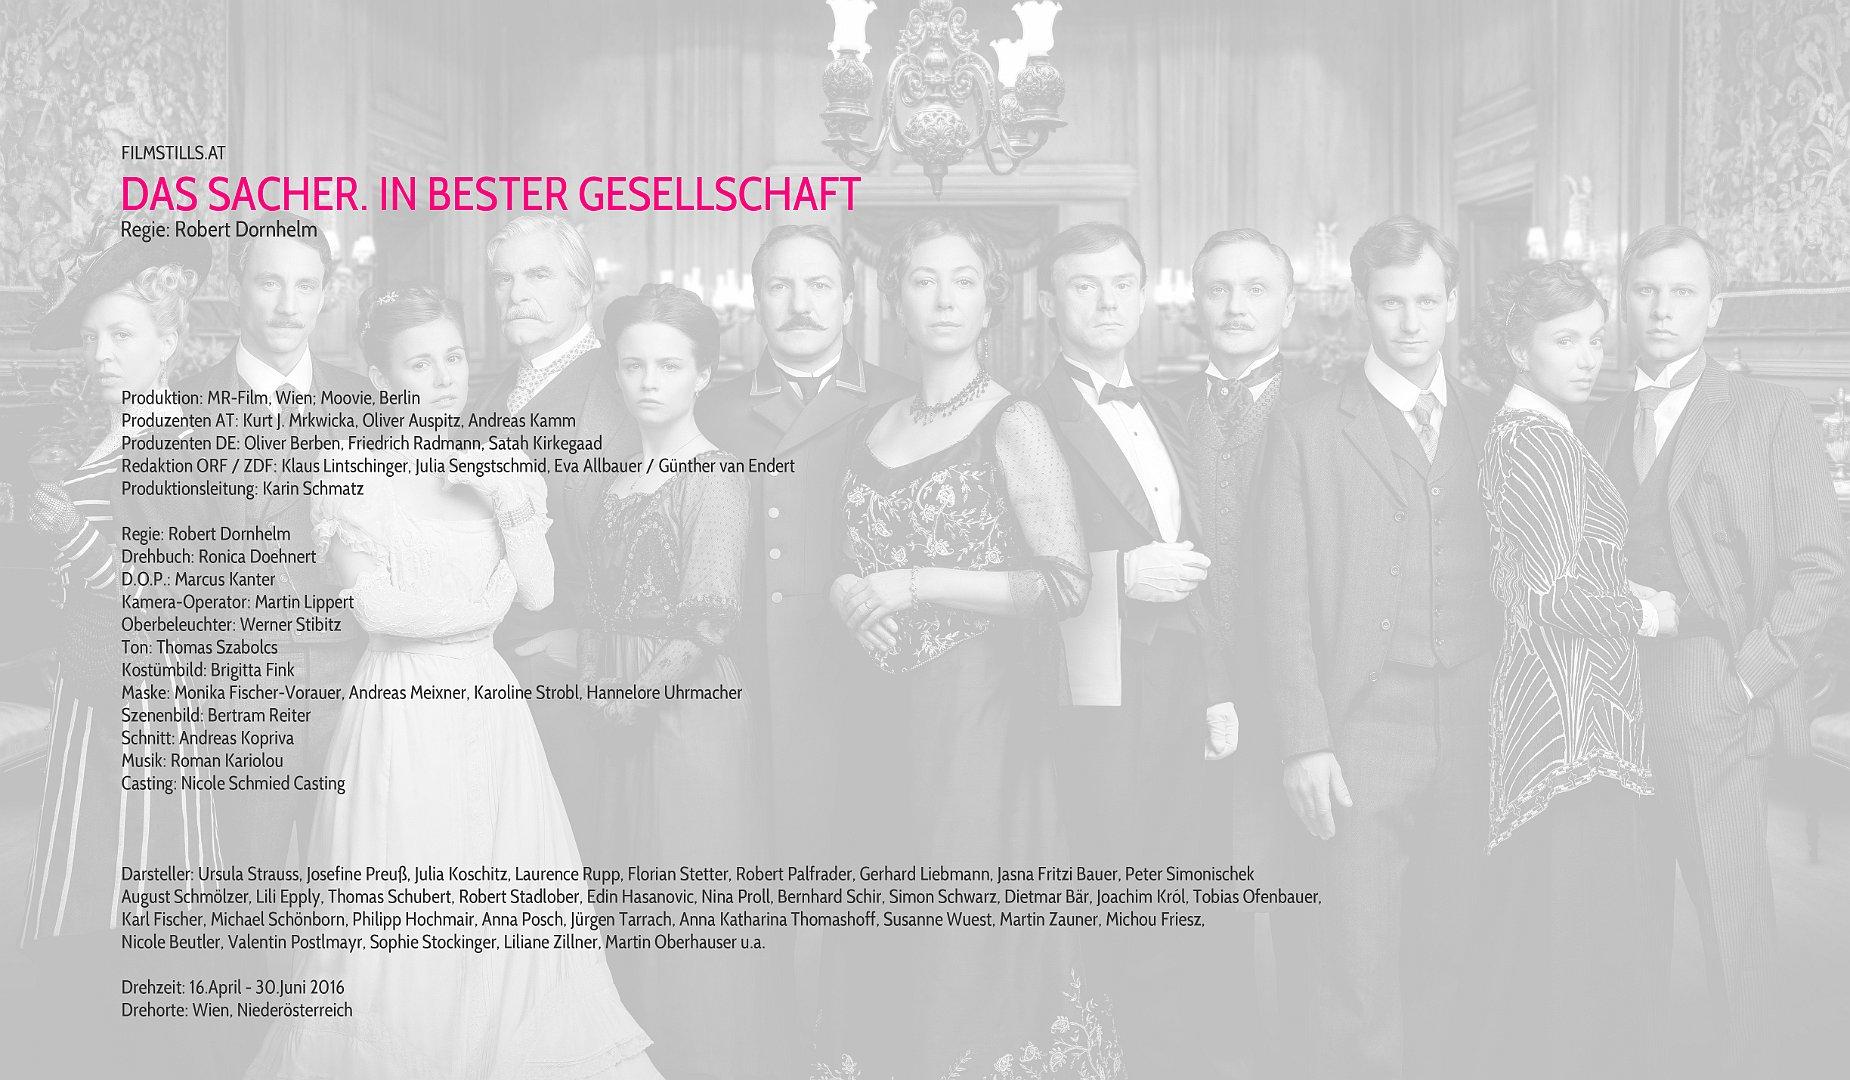 Ofenbauer Berlin filmstills at das sacher in bester gesellschaft regie robert